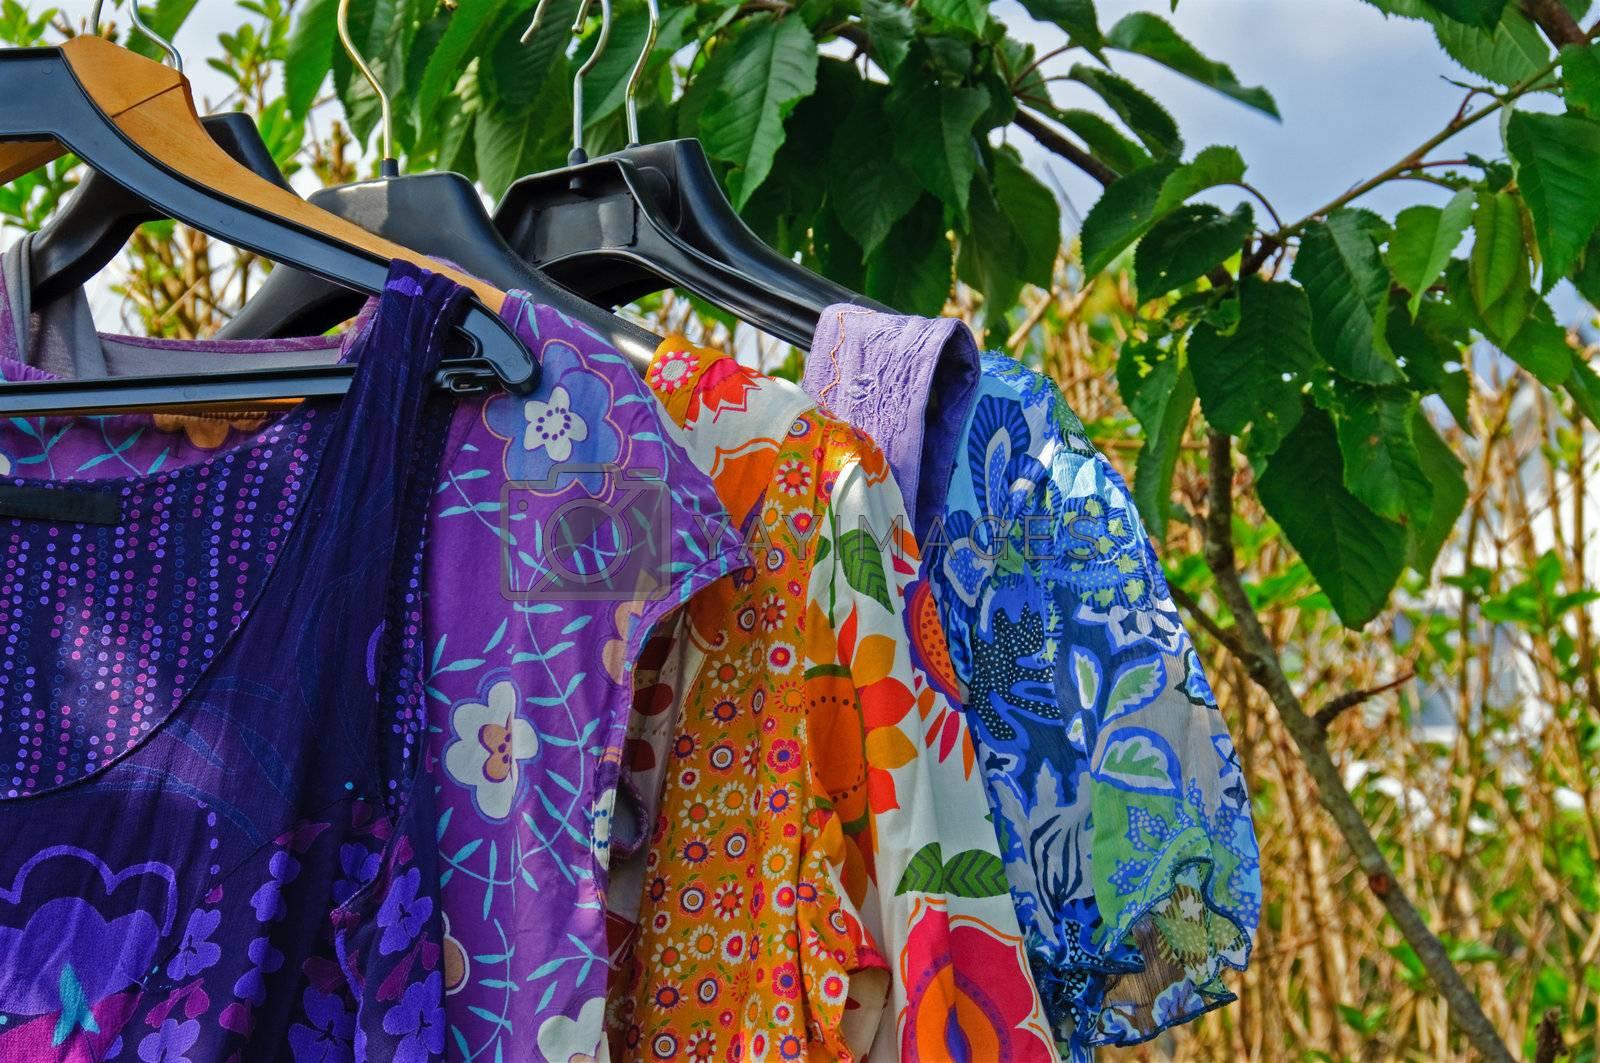 Summer dresses hanging in a garden